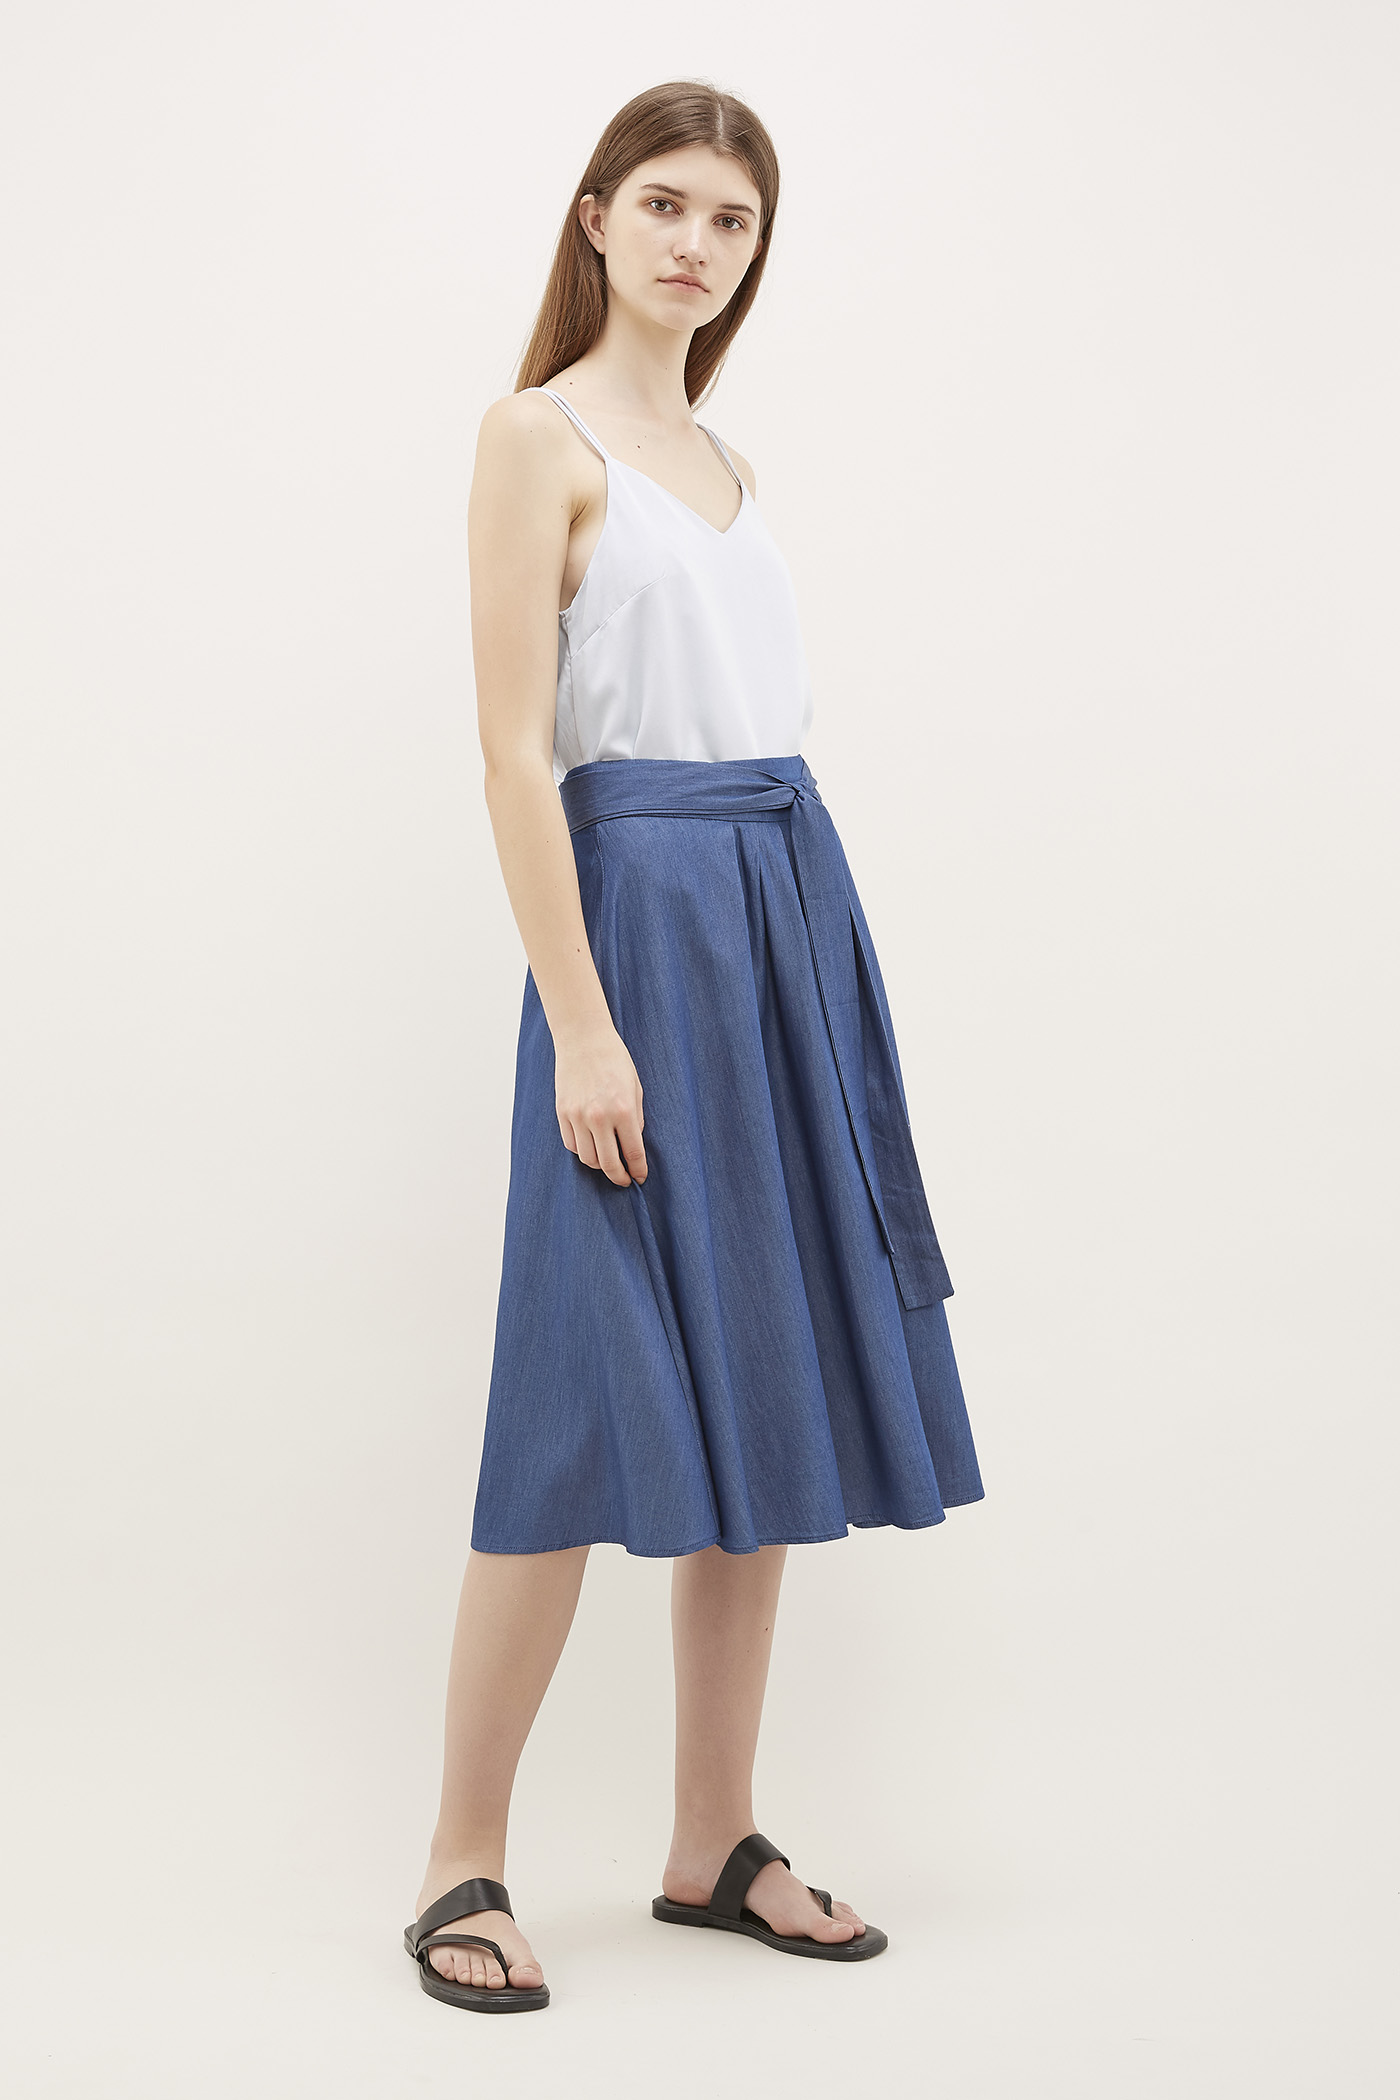 Yalena Pleated Midi Skirt